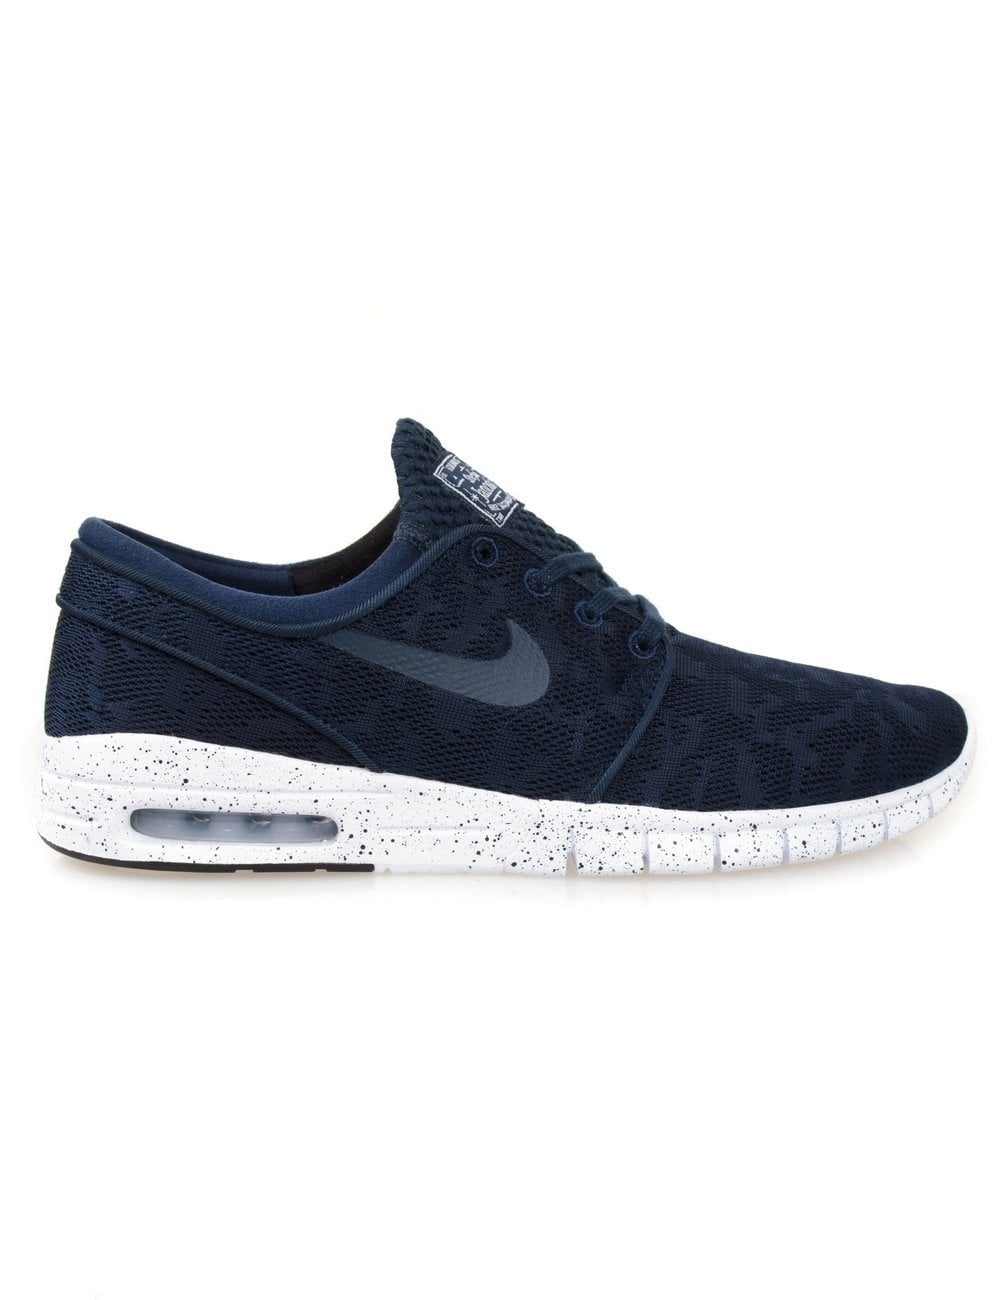 bef26184c978 Nike SB Stefan Janoski Max - Midnight Navy - Footwear from Fat Buddha Store  UK